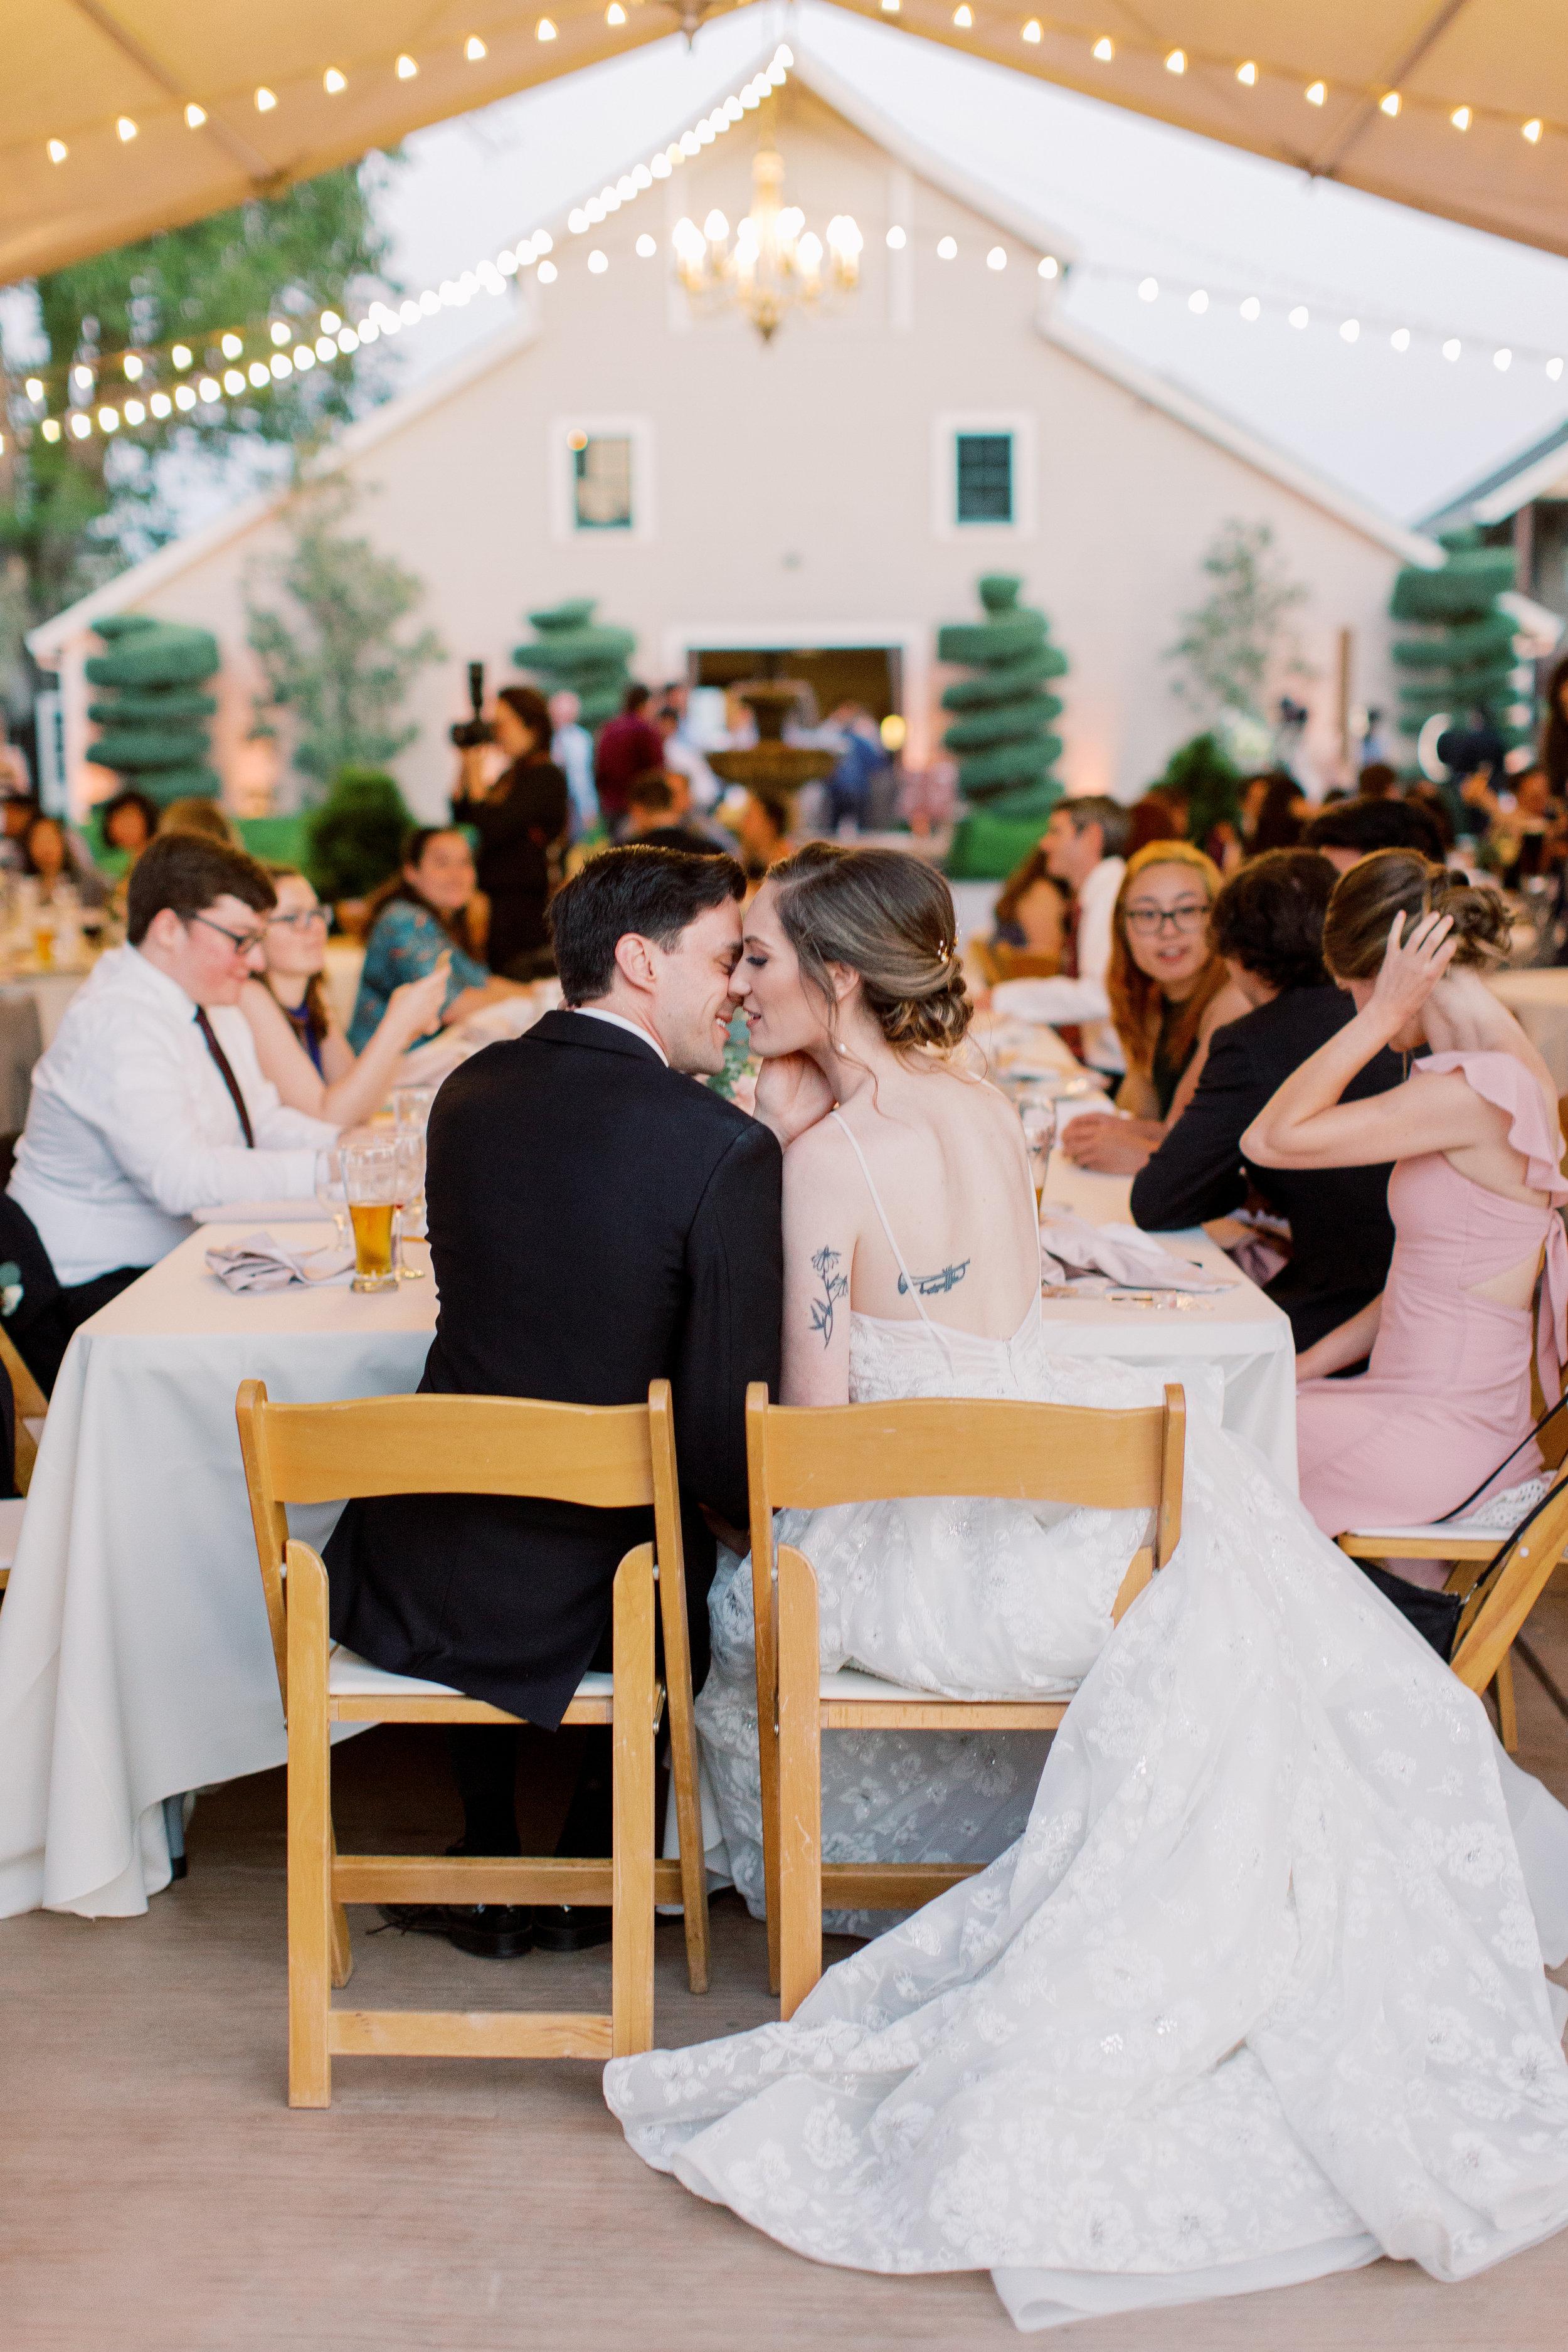 Scribner-bend-vineyards-wedding-sacramento-california-Kristine-Herman-Photography-197.jpg